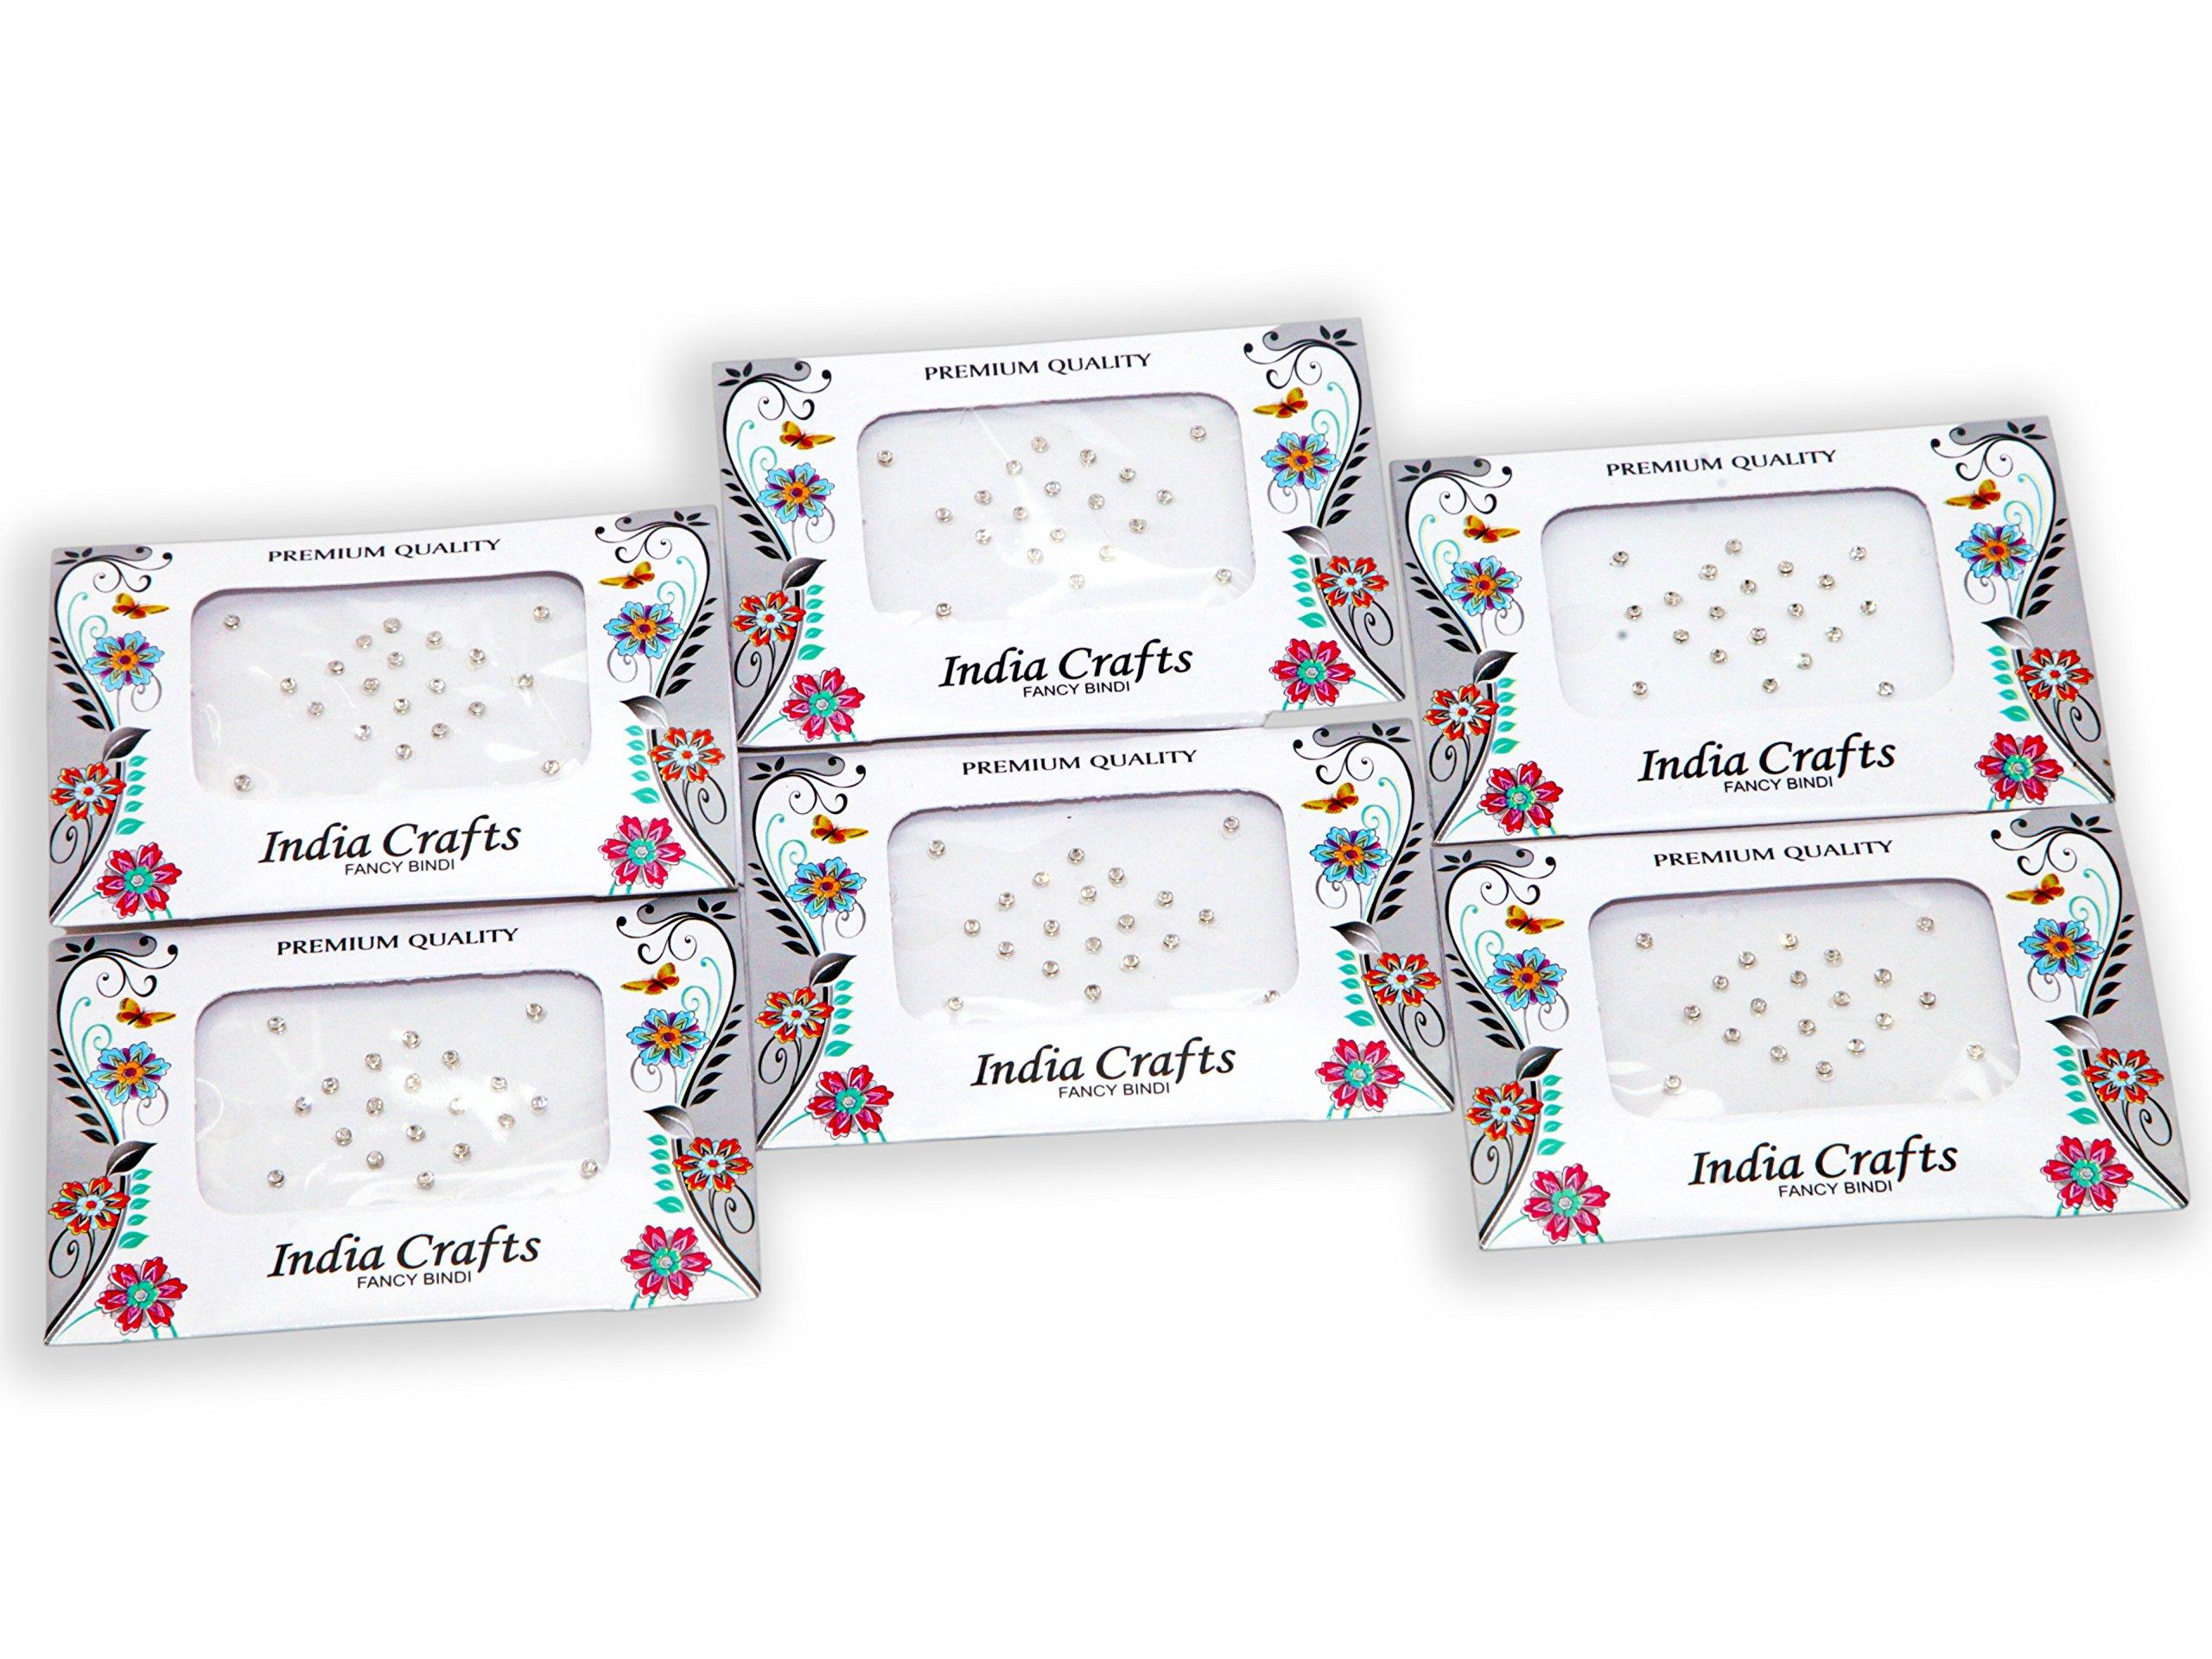 120 Bindi Dots Diamond Crystal Fake Nose stud/Ear Stud India Crafts bindi stickers bindi crystal